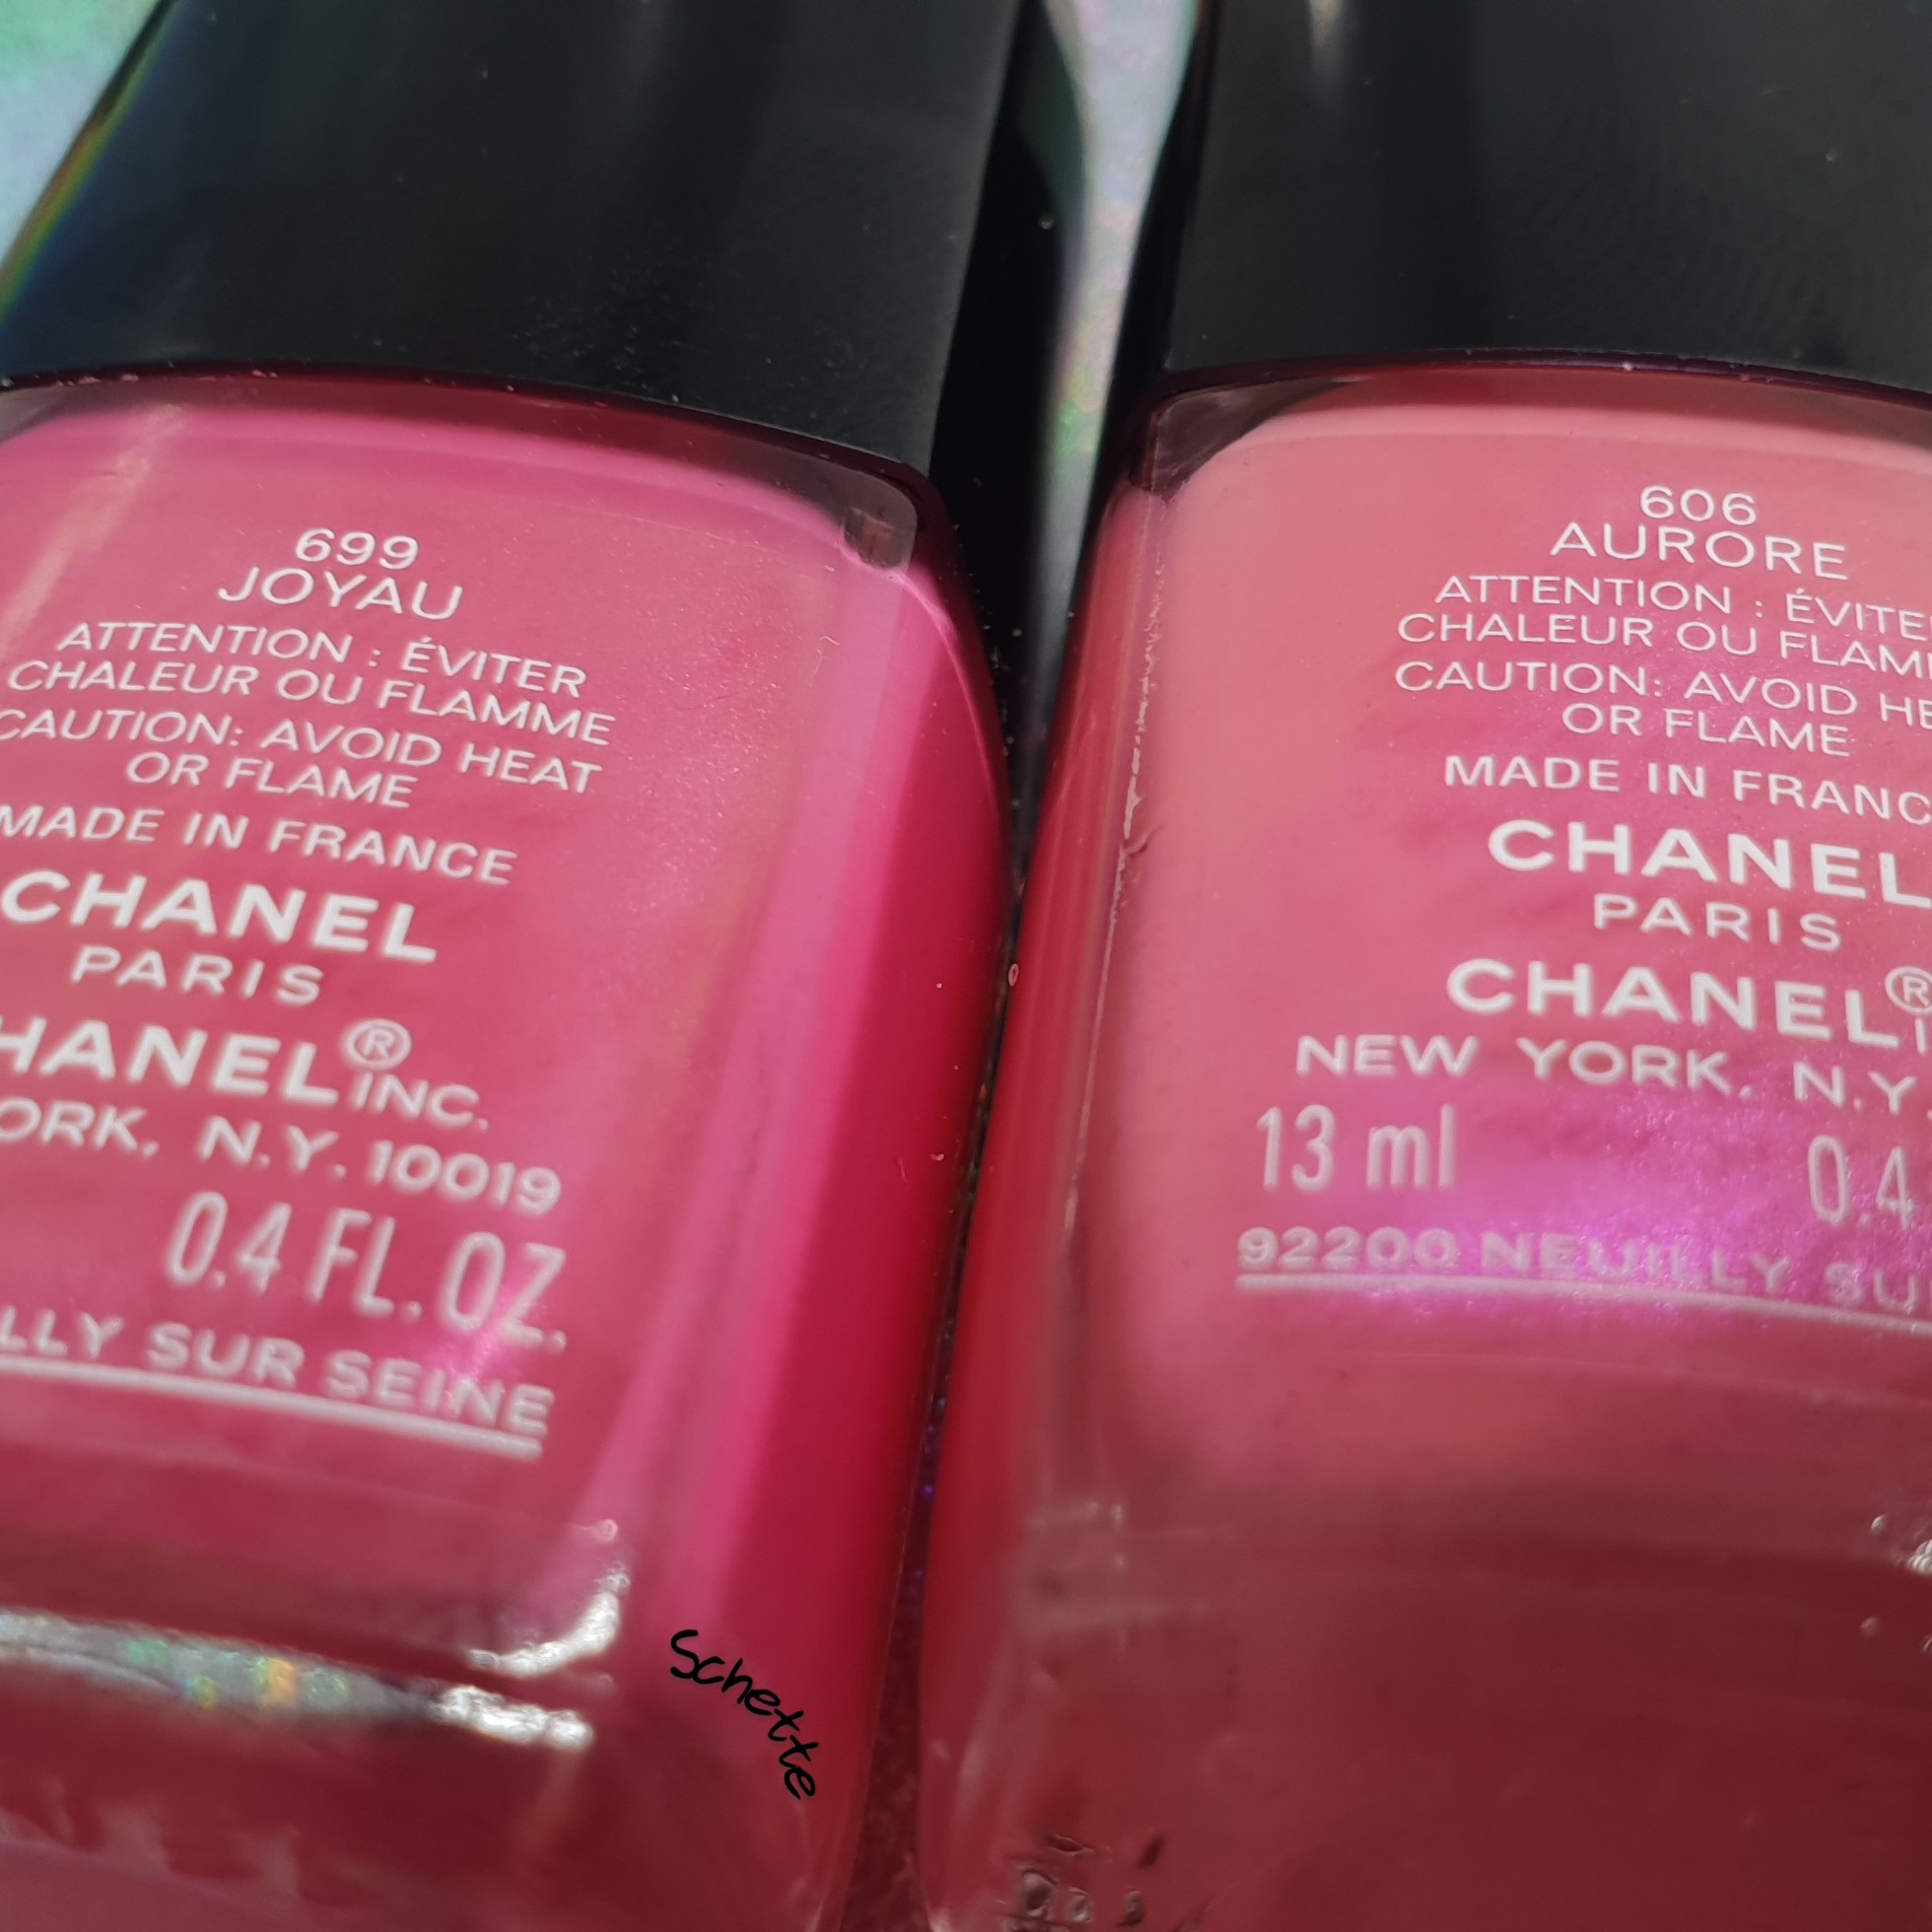 Chanel - Aurore